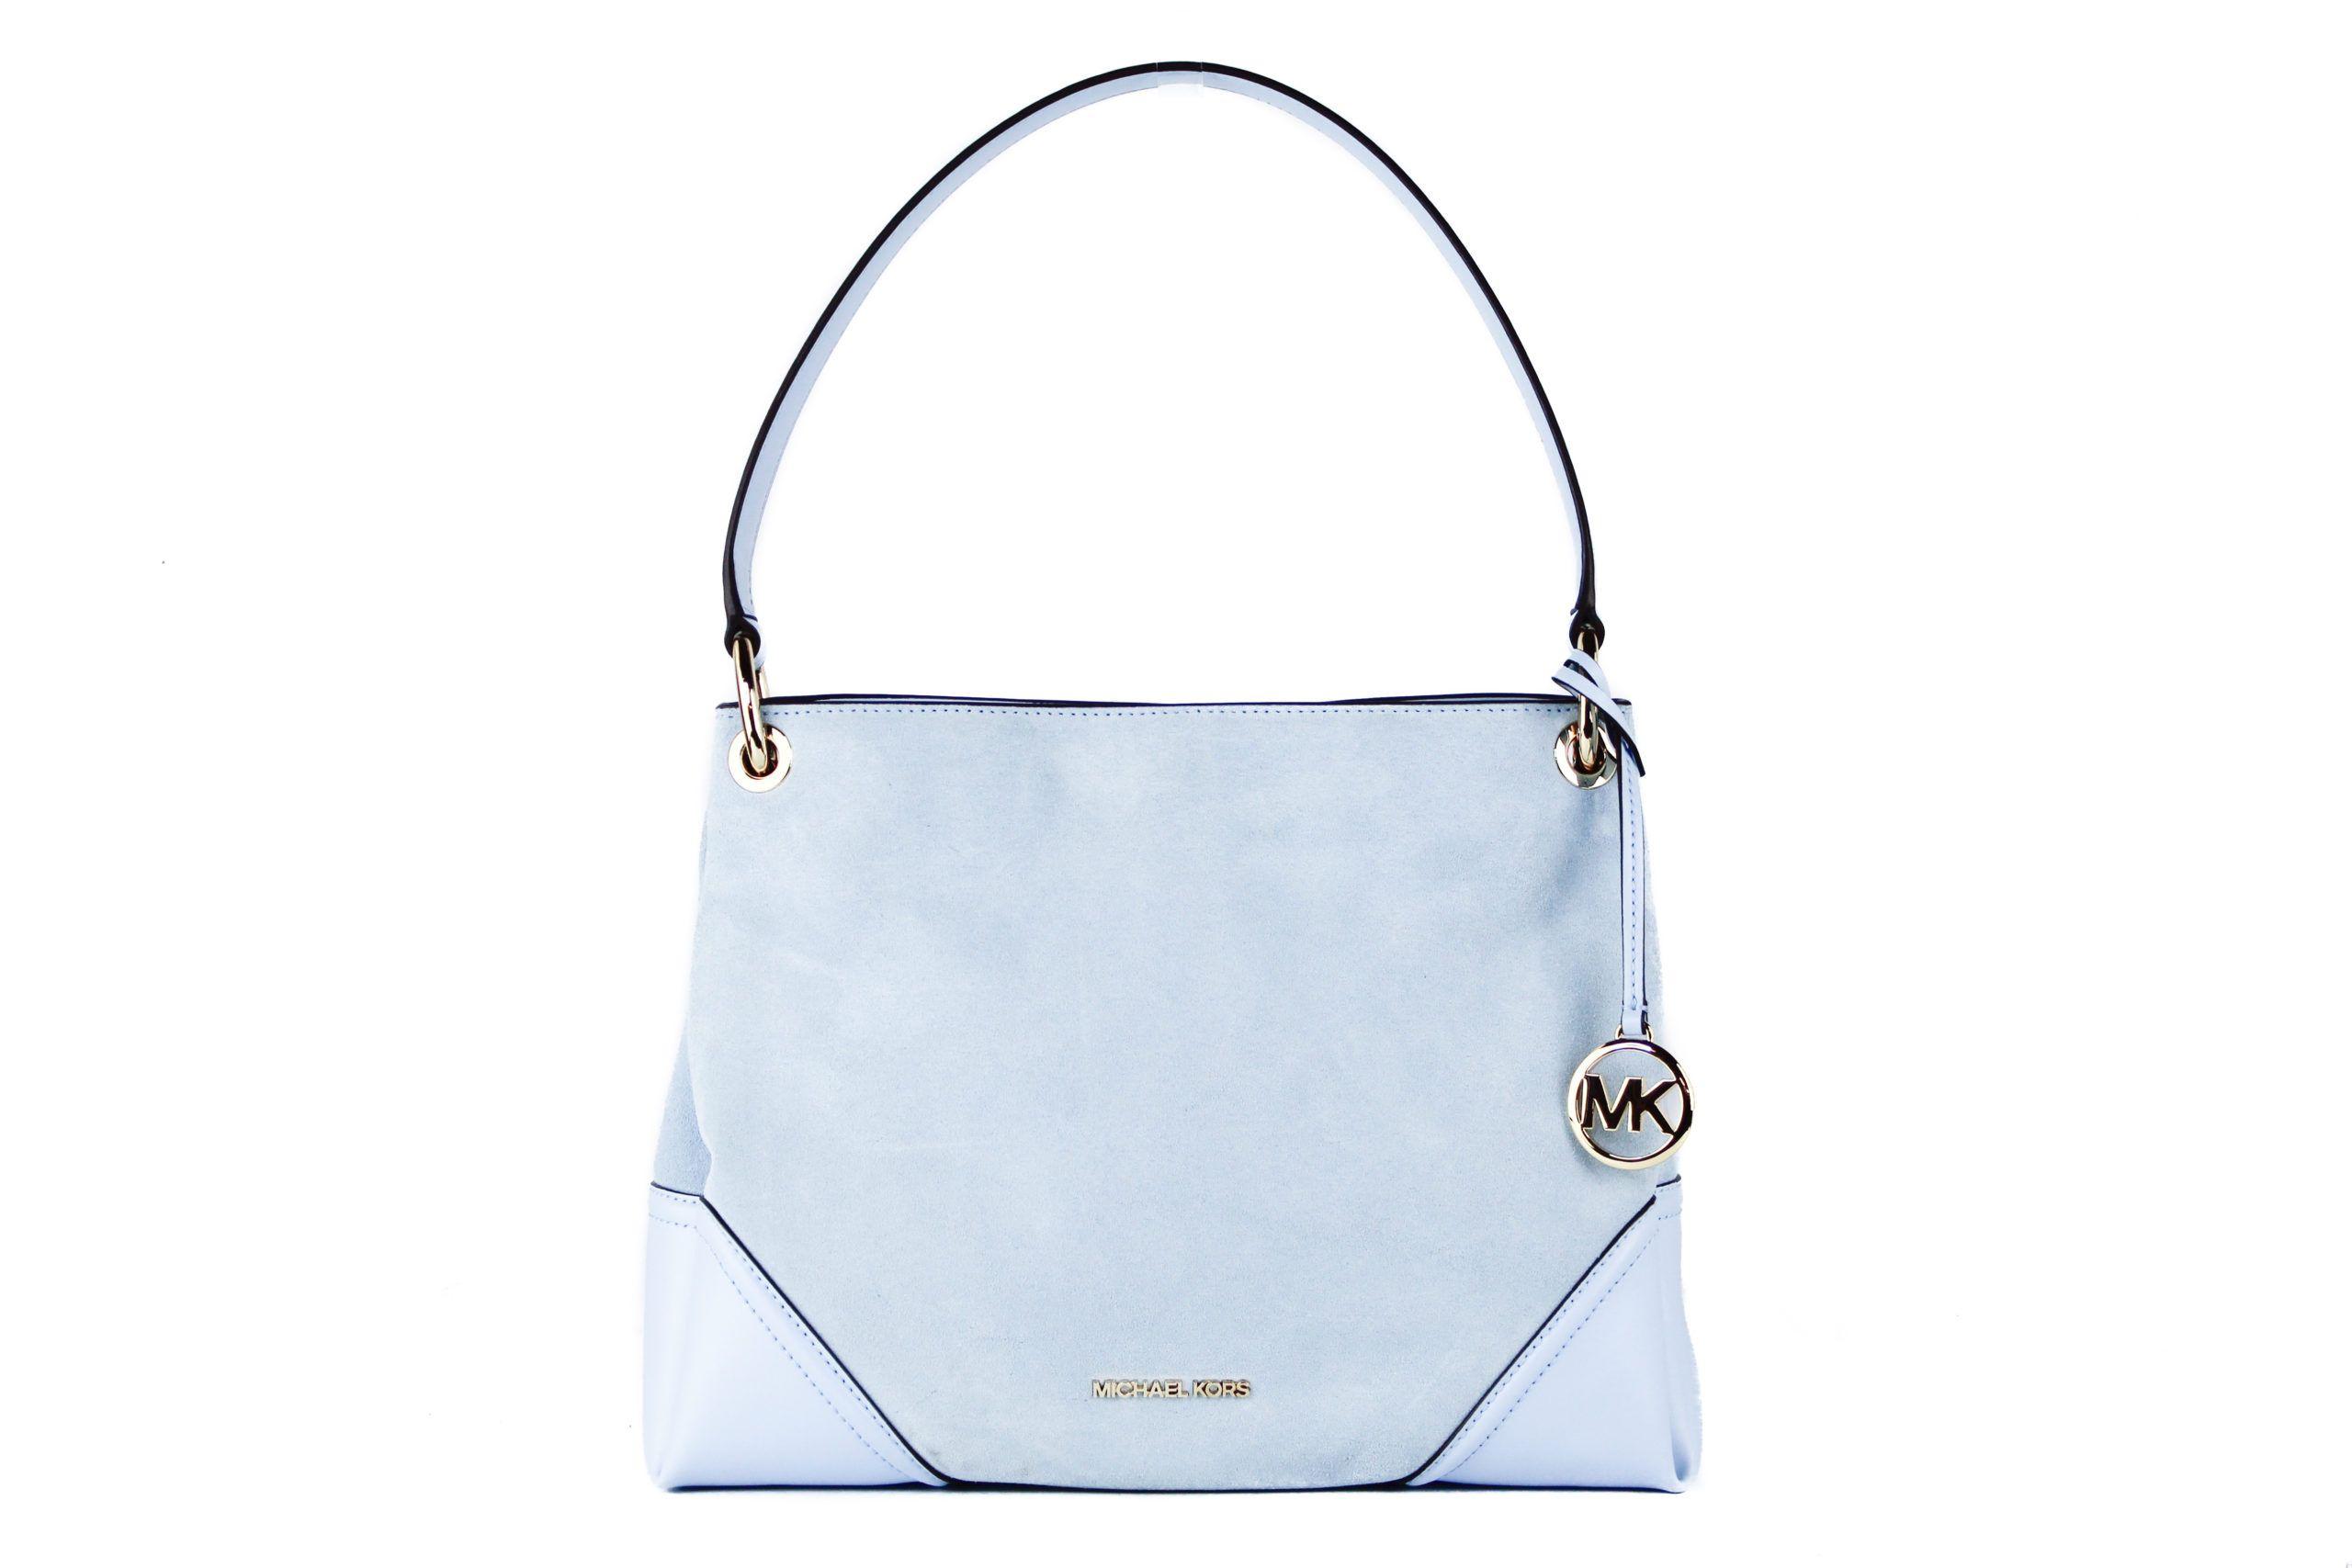 Michael Kors Nicole Medium Leather Suede Shoulder Handbag (Light Sky Solid)